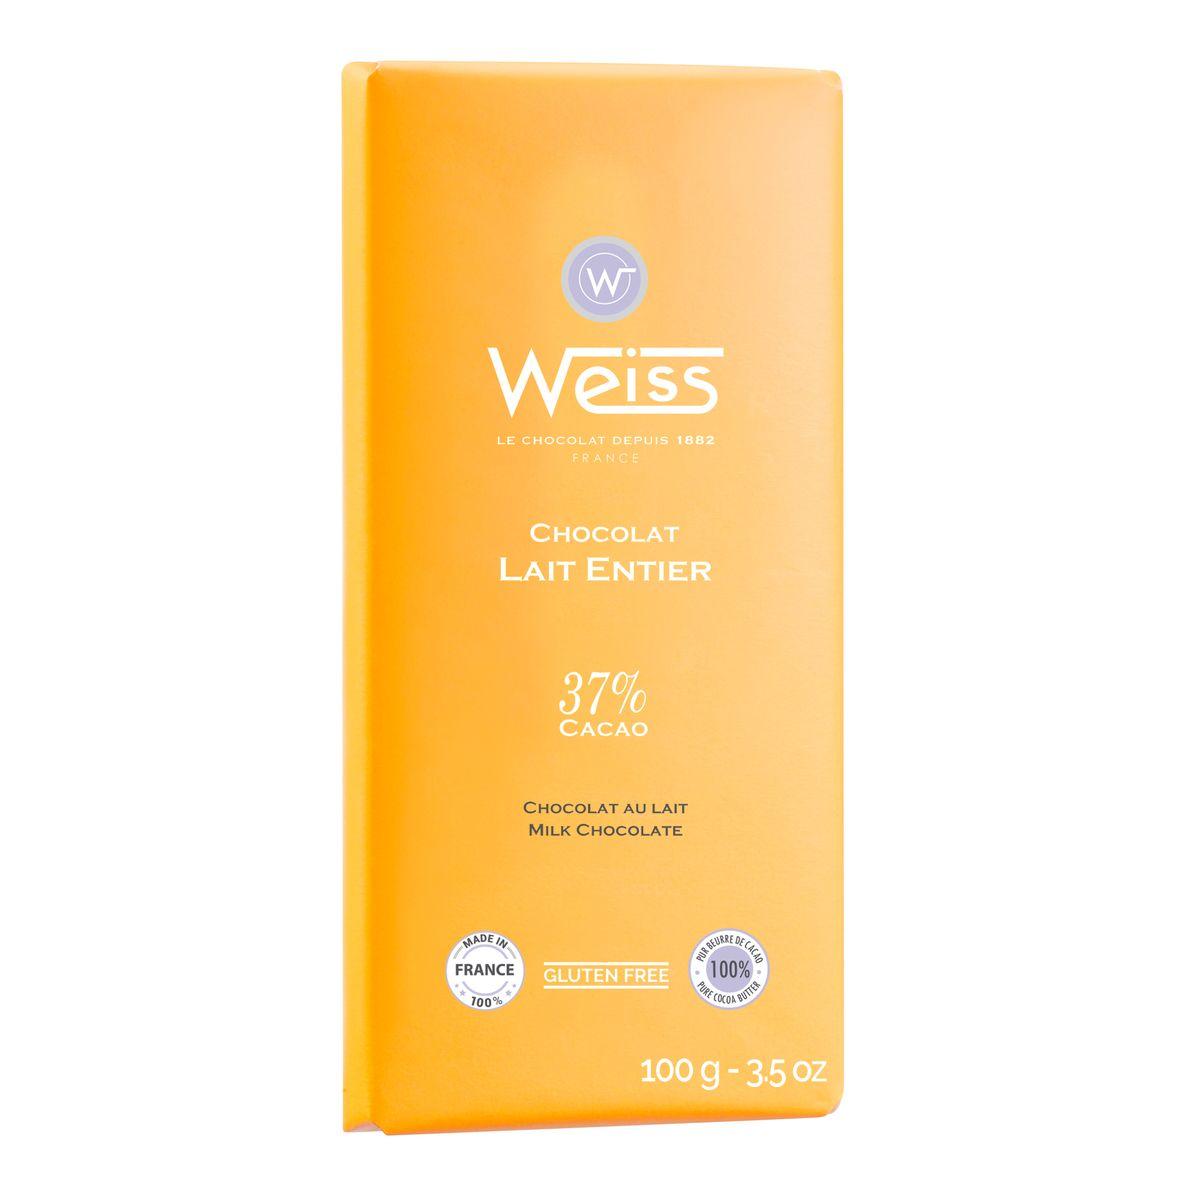 Tablette lait entier 37% 100gr - Weiss